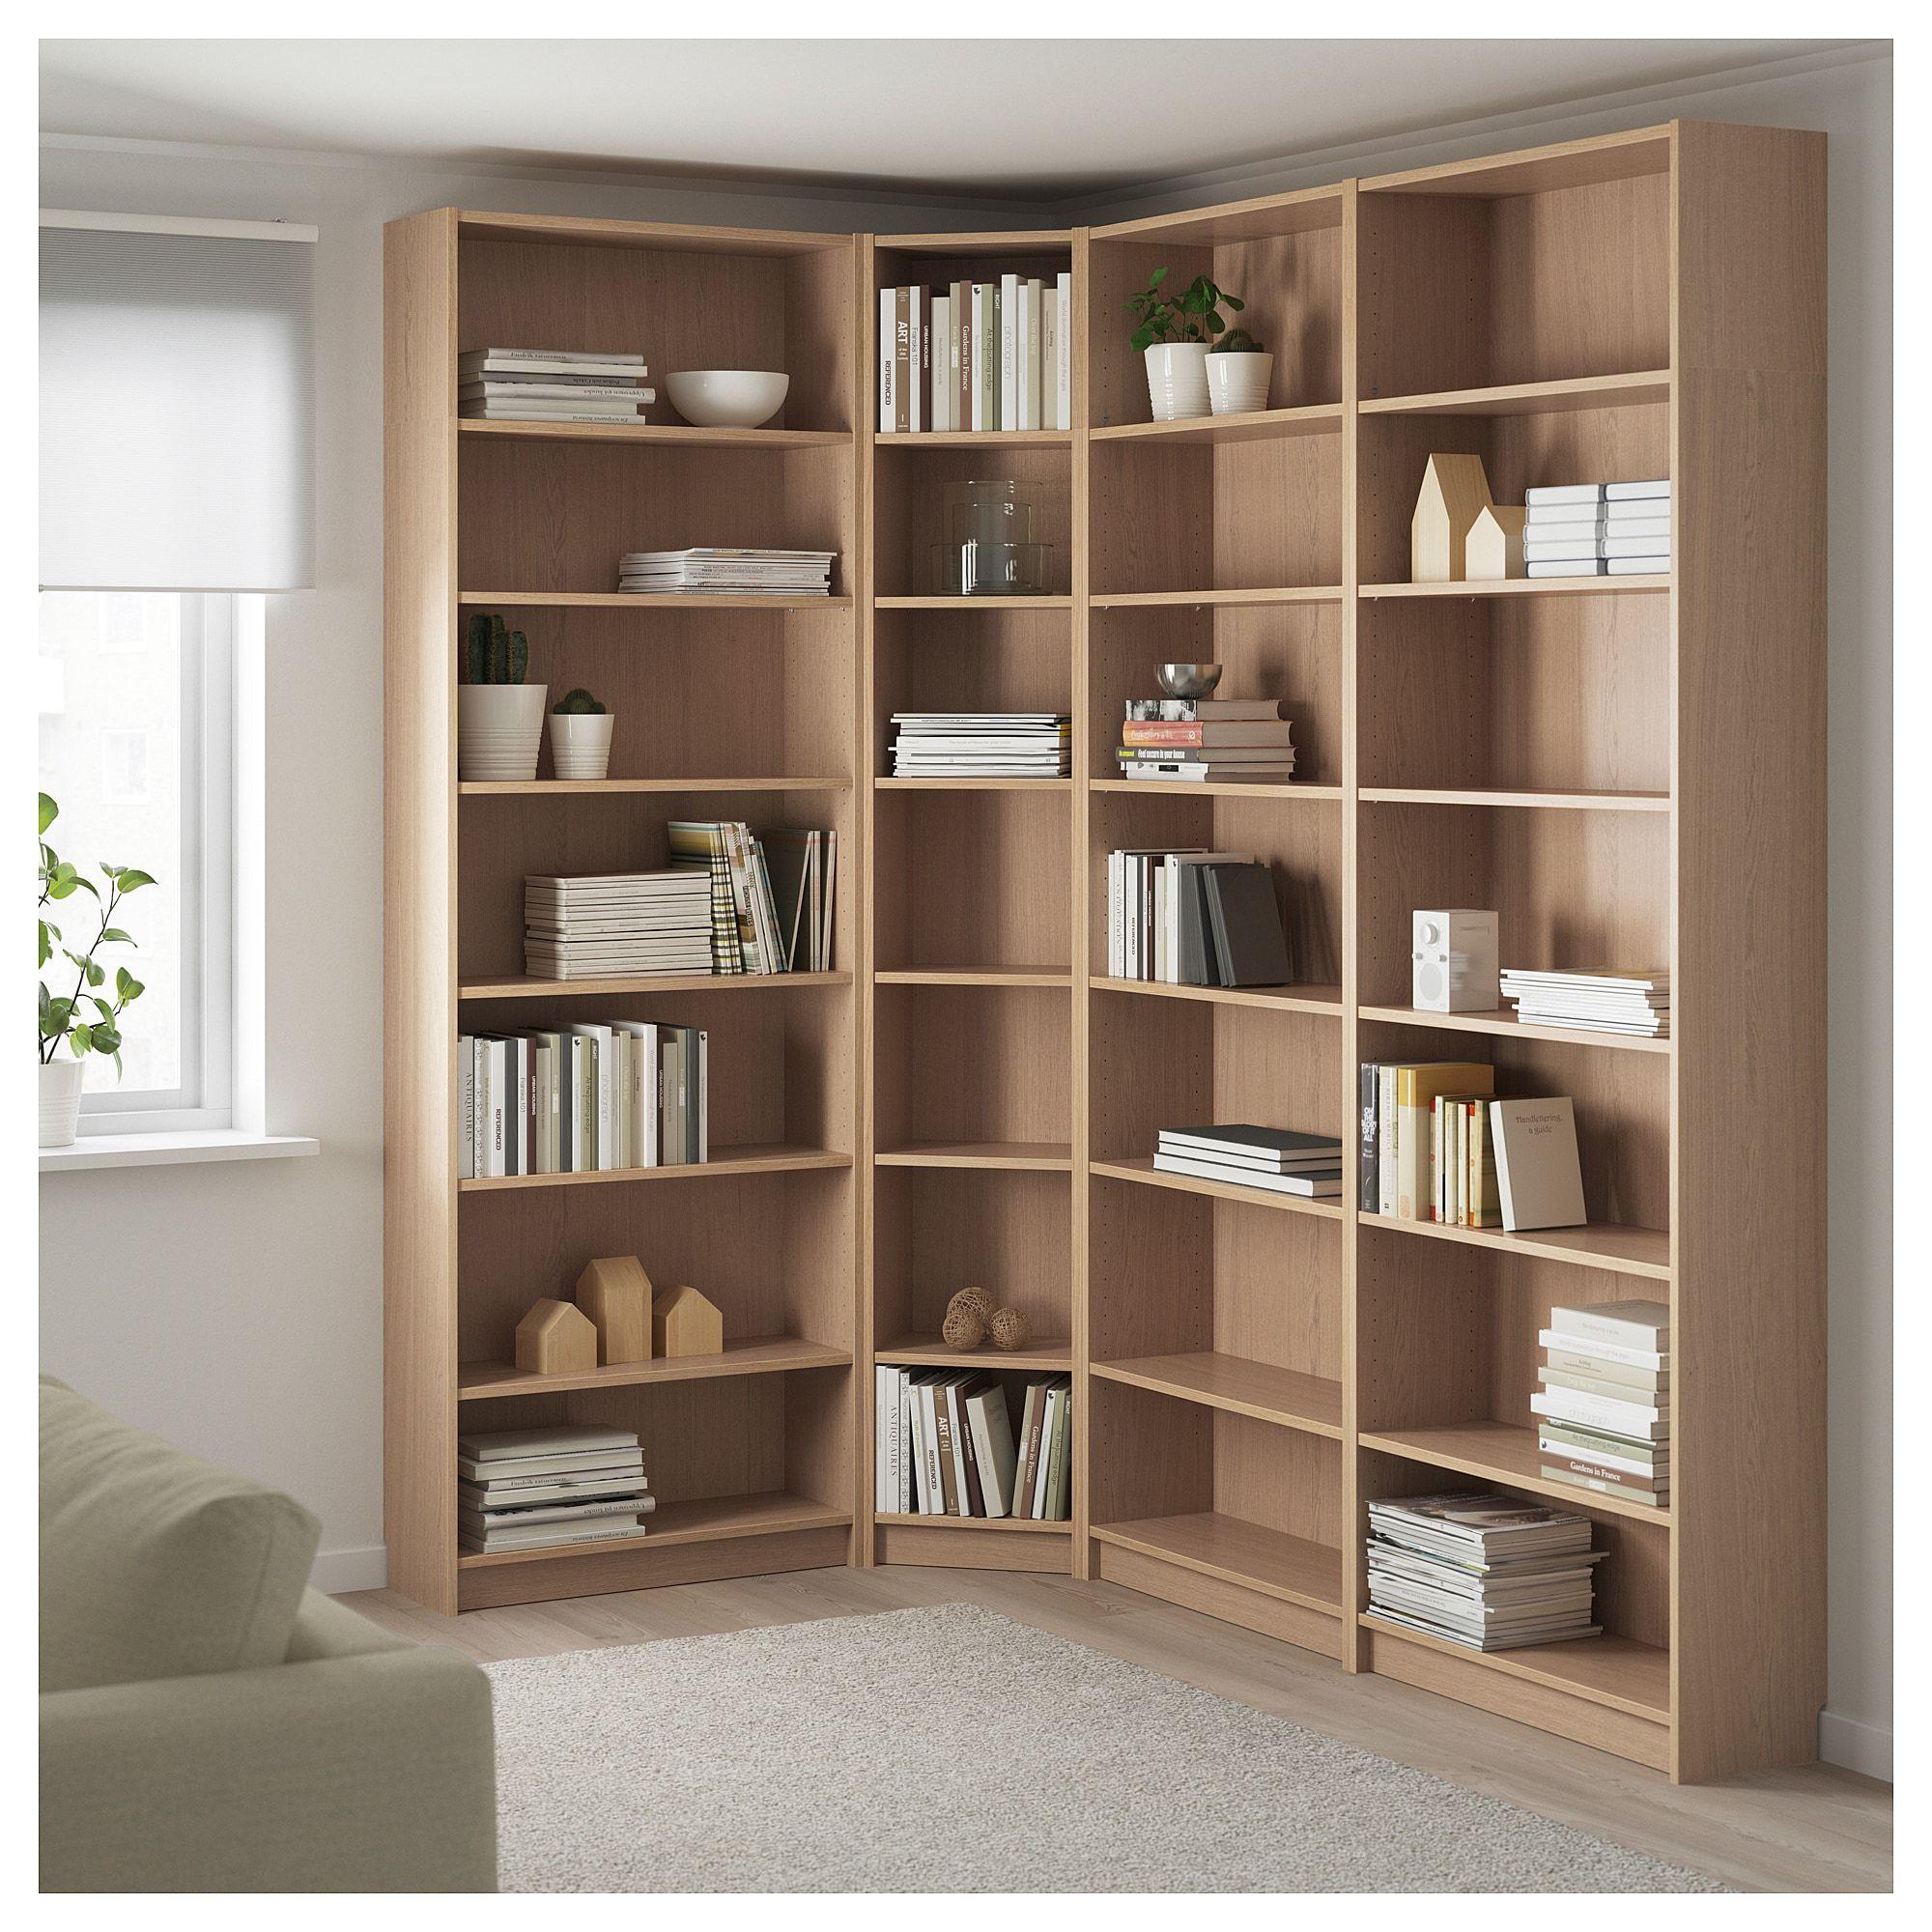 Bücherregal Ideen: kreativ organisiert – IKEA IKEA Österreich